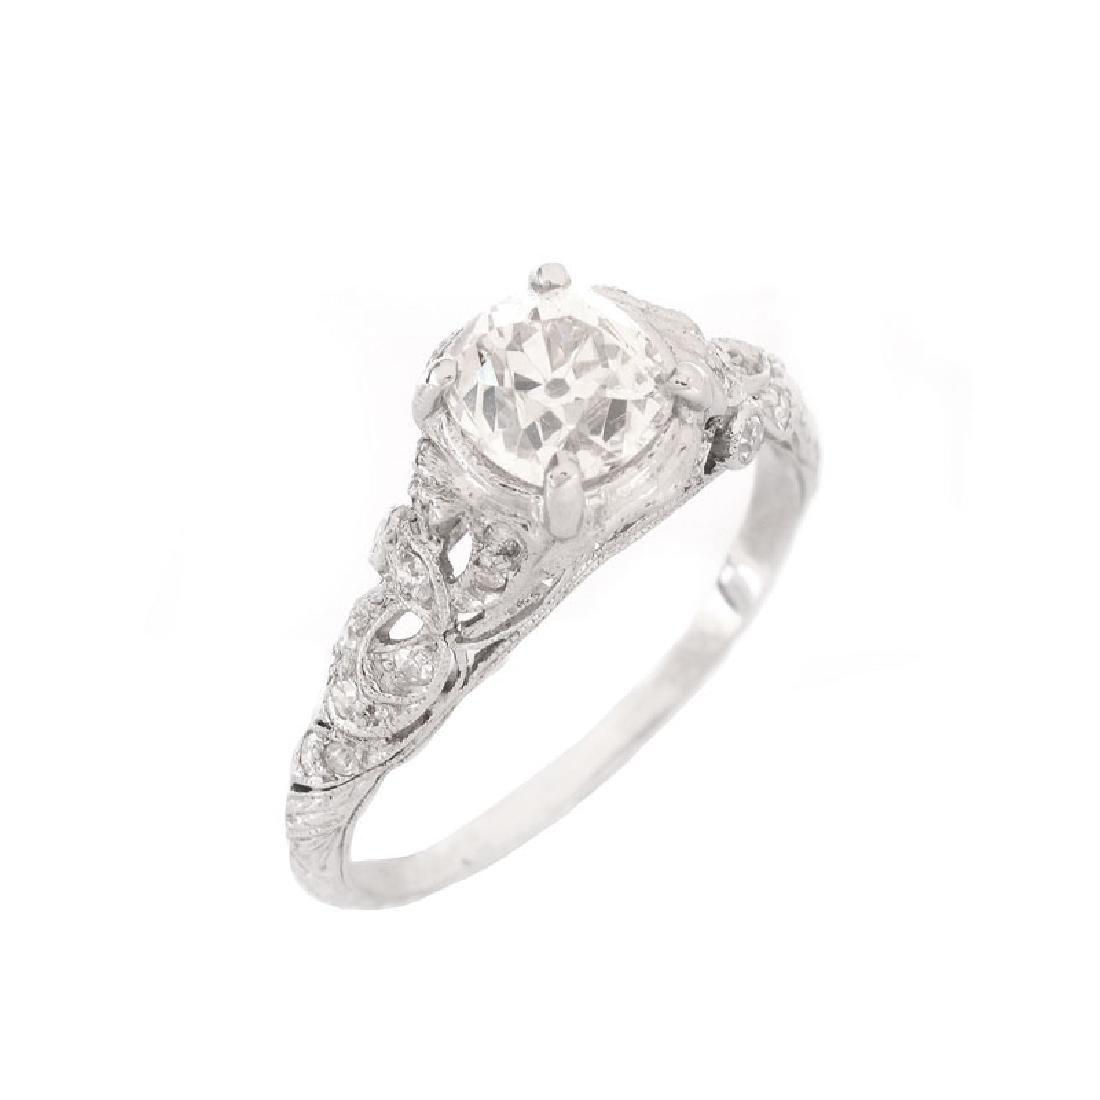 Approx. 1.37 Carat TW Diamond and Platinum Engagement